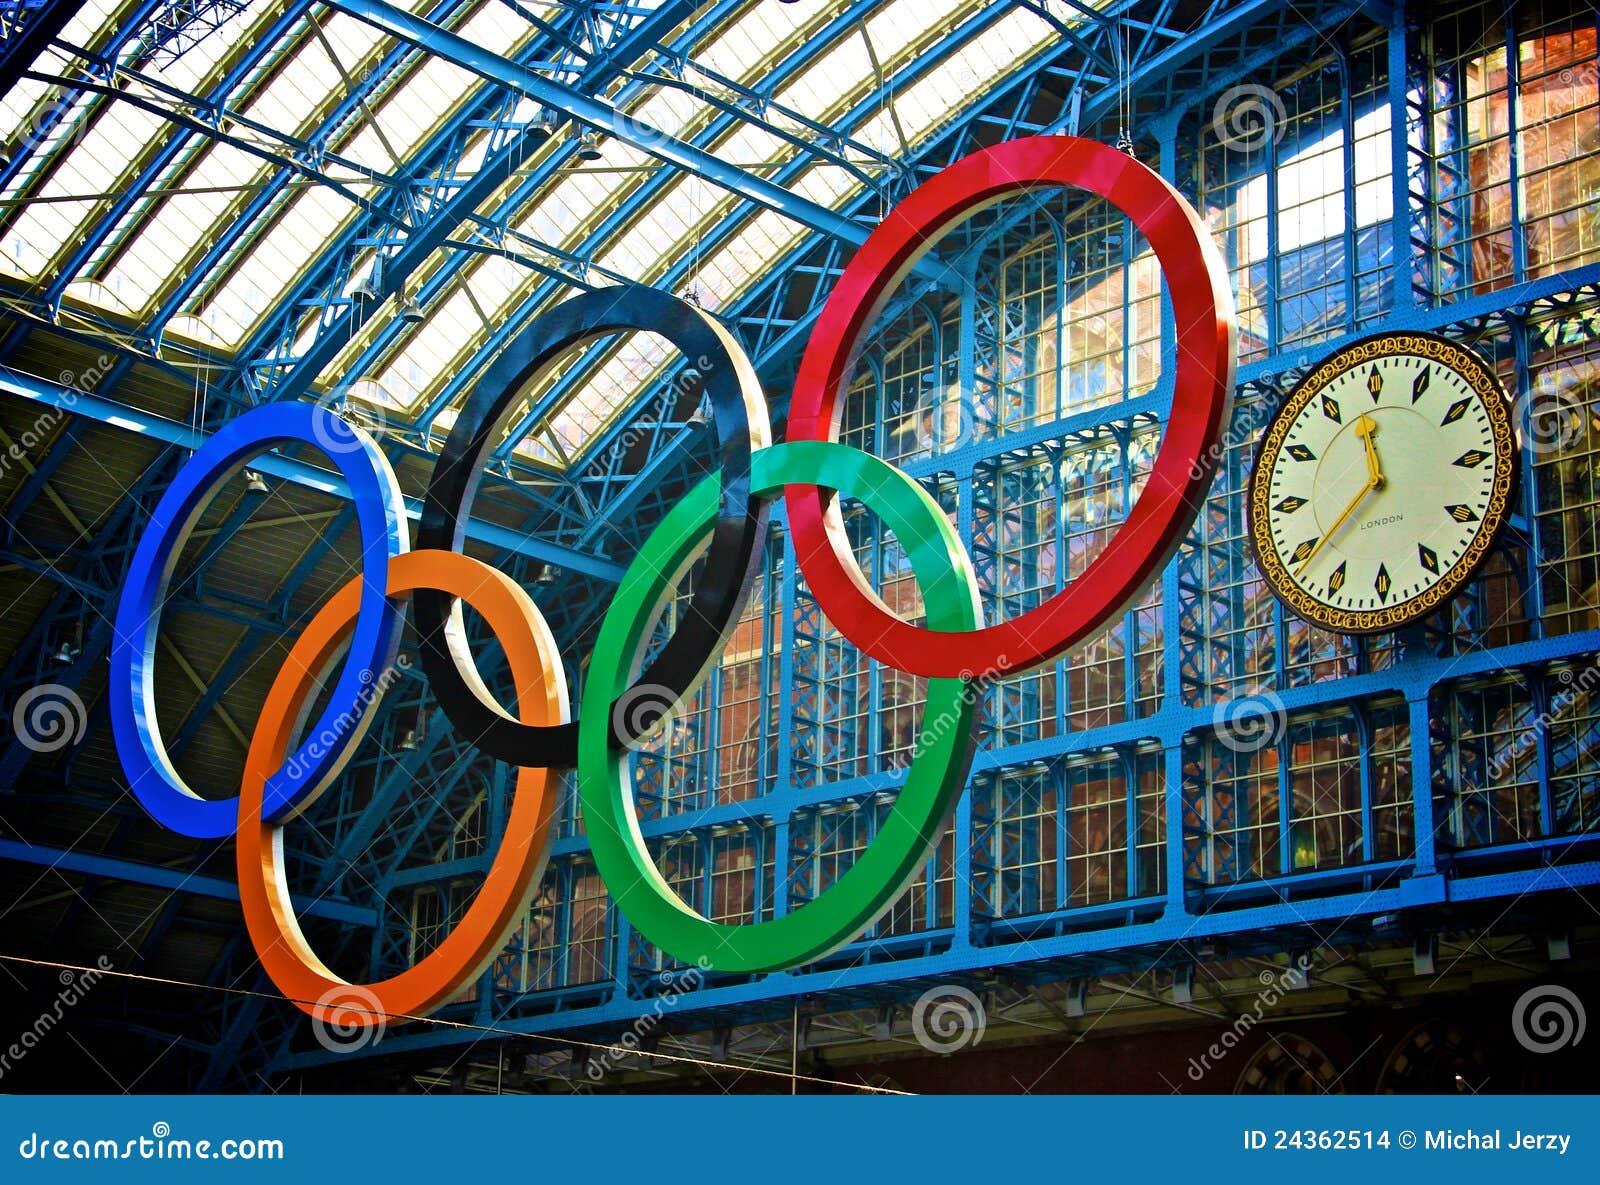 Londonolympics-Count-down 2012